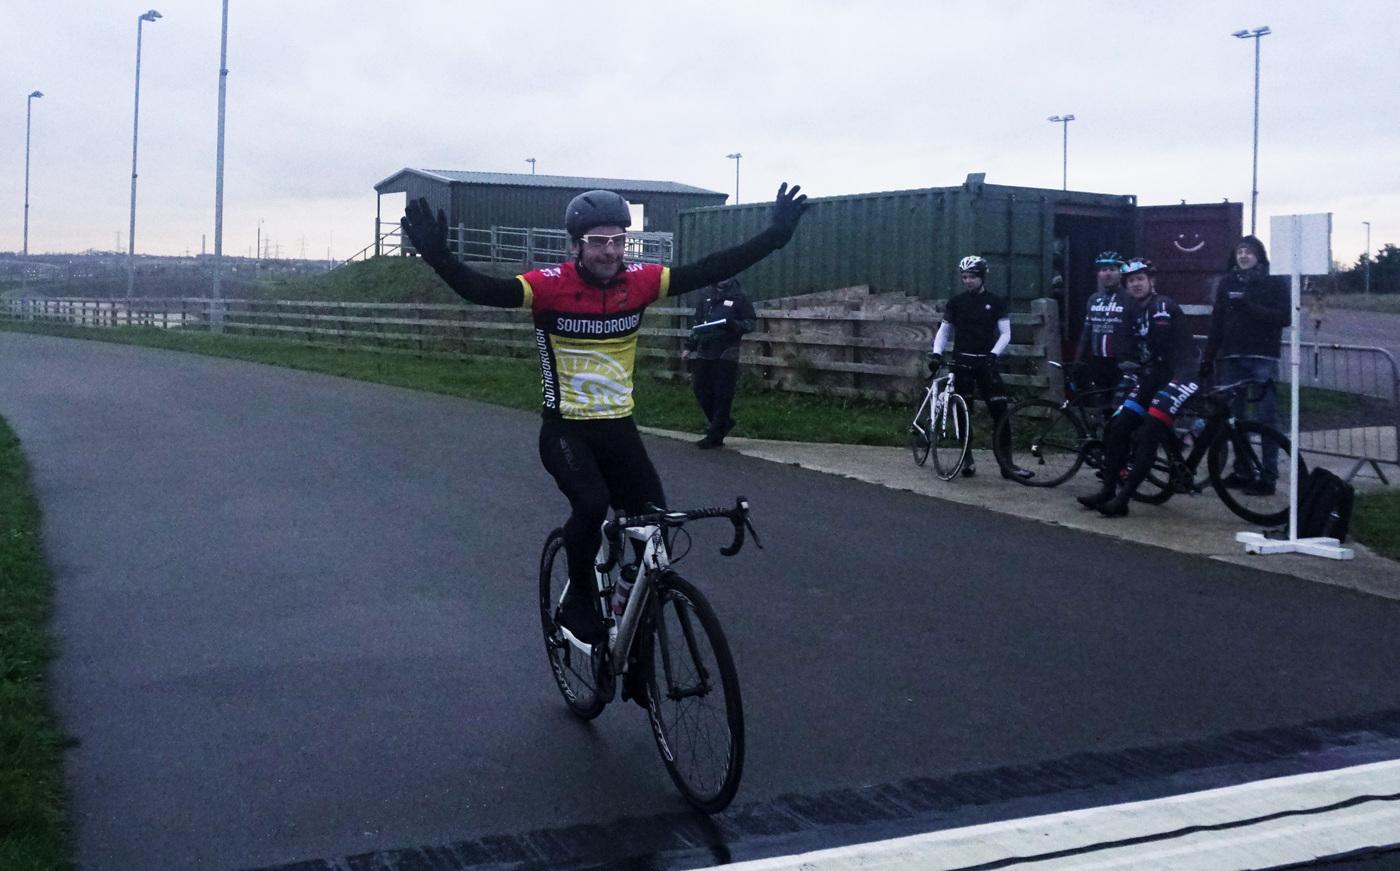 Cyclopark  5 e123 winner